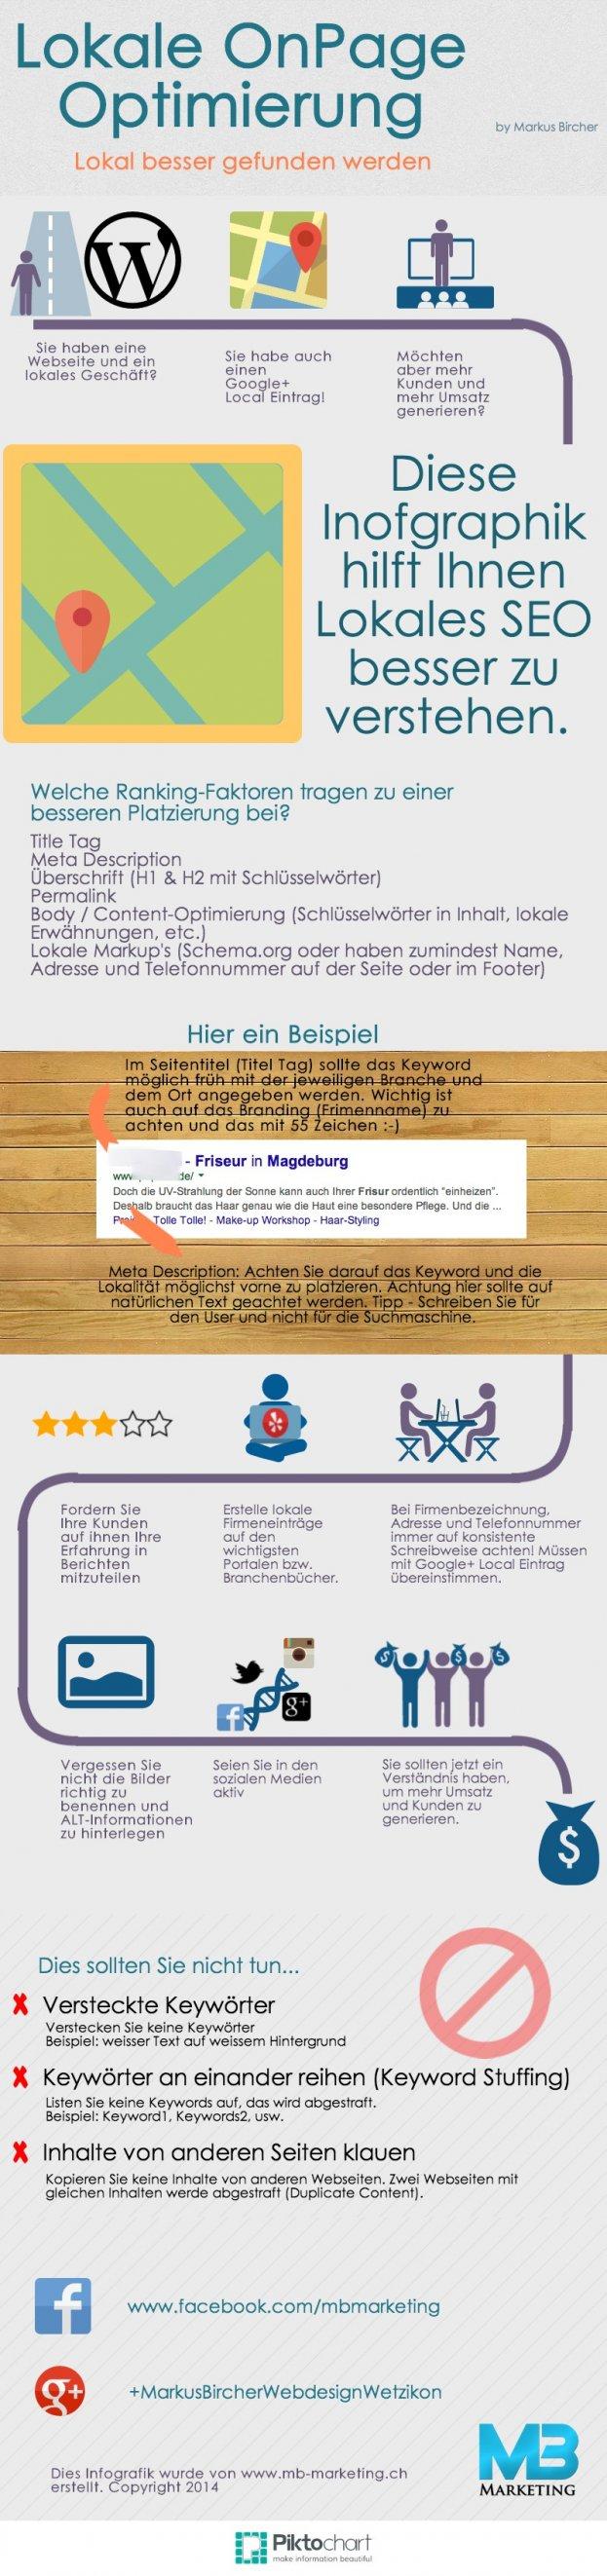 Infografik Local SEO